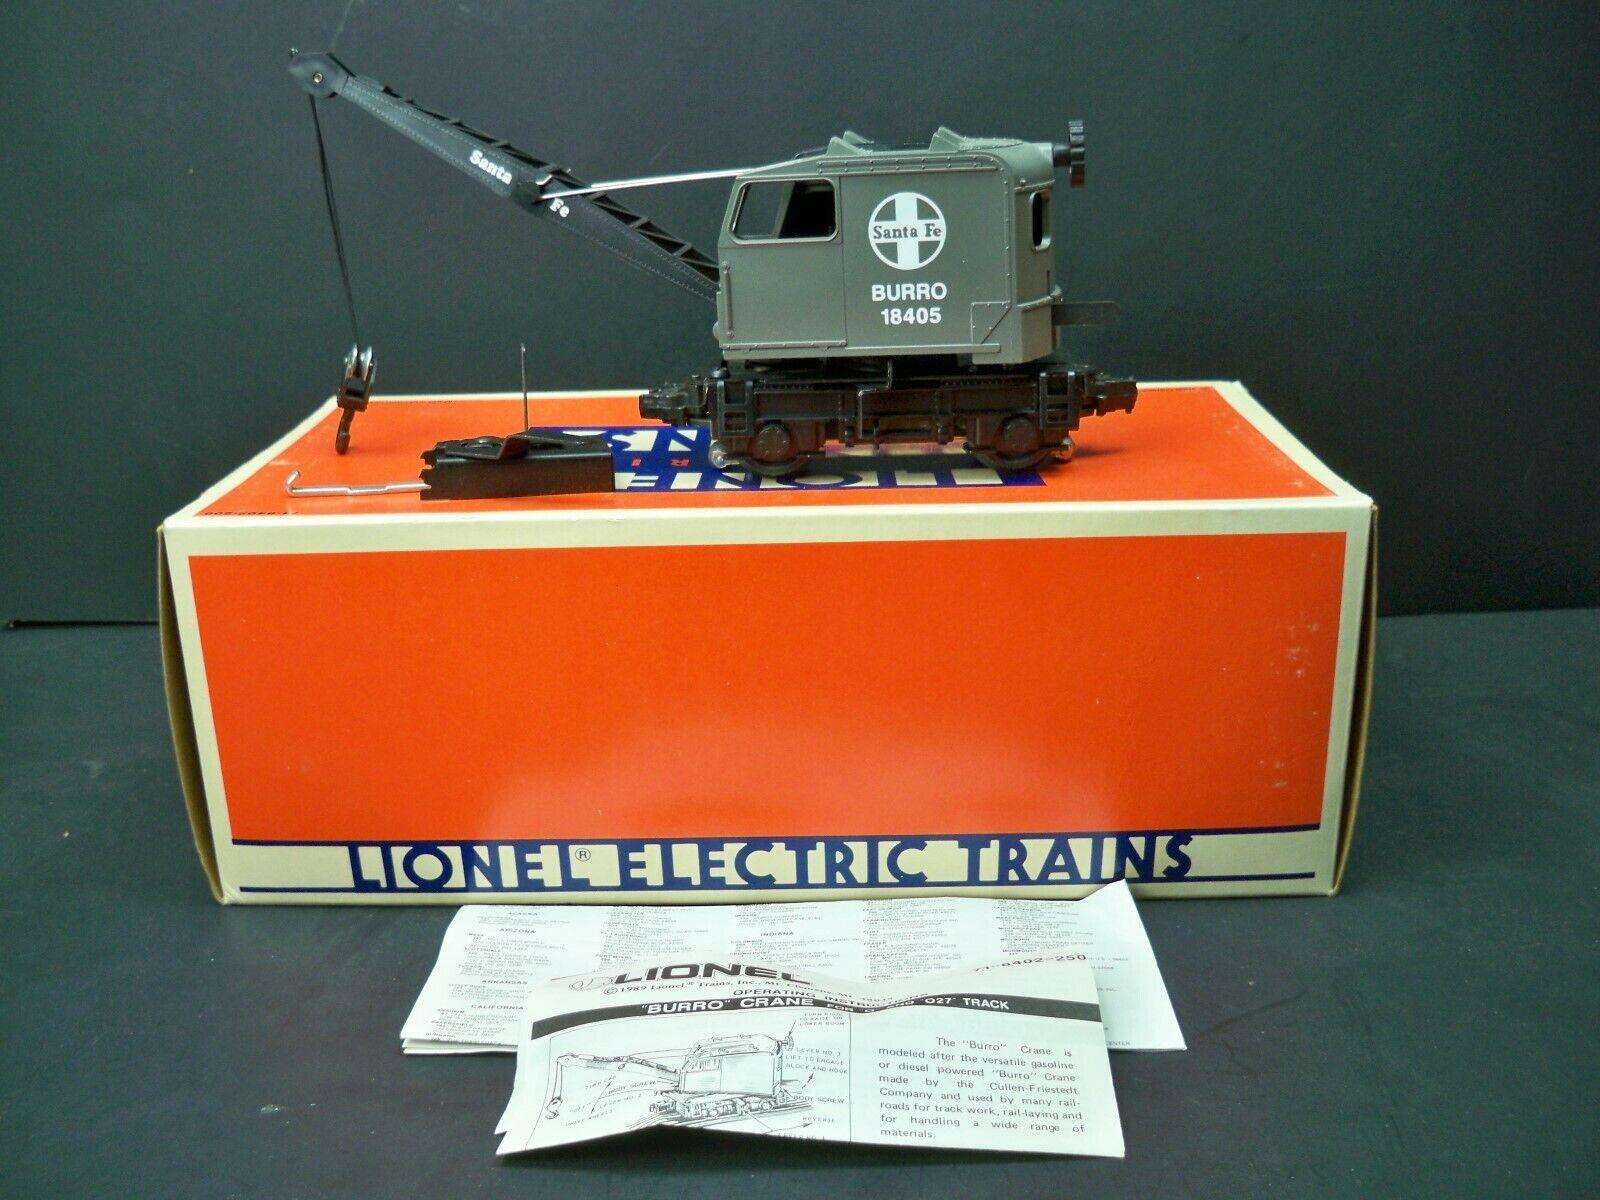 Lionel Train 6-18405 Santa Fe Burro Crane Car W  Actuator - Orig. Box - O Gauge